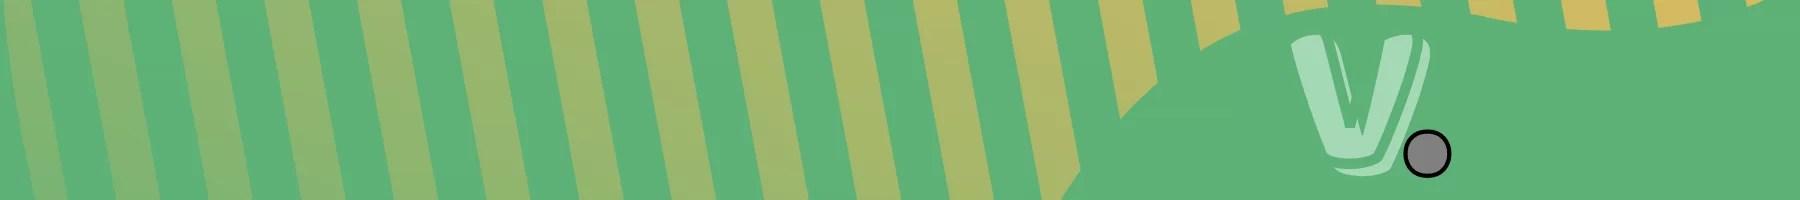 Untitled design (34)